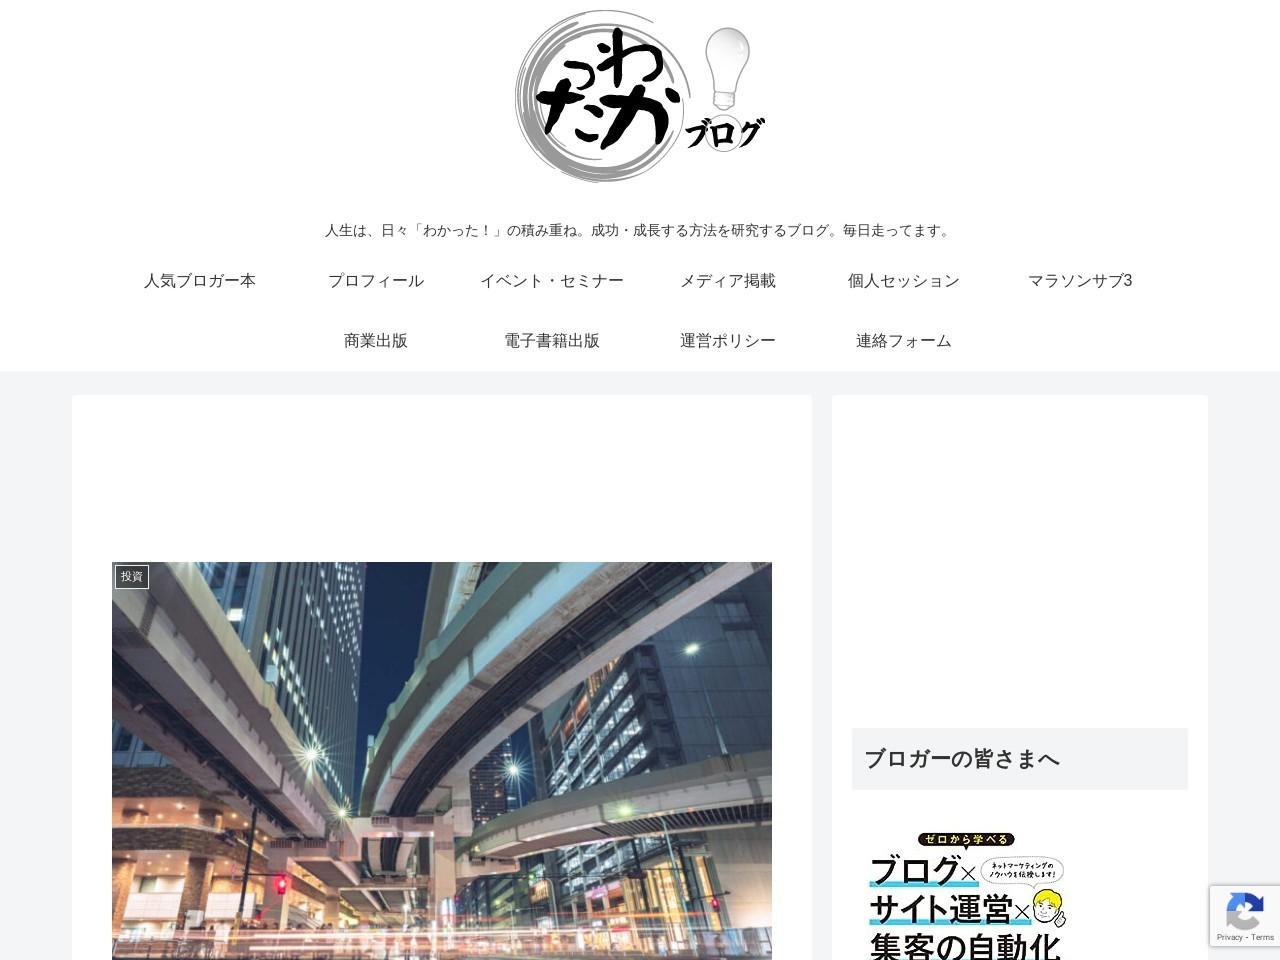 http://www.wakatta-blog.com/brand-seo-next-to-contents-seo.html